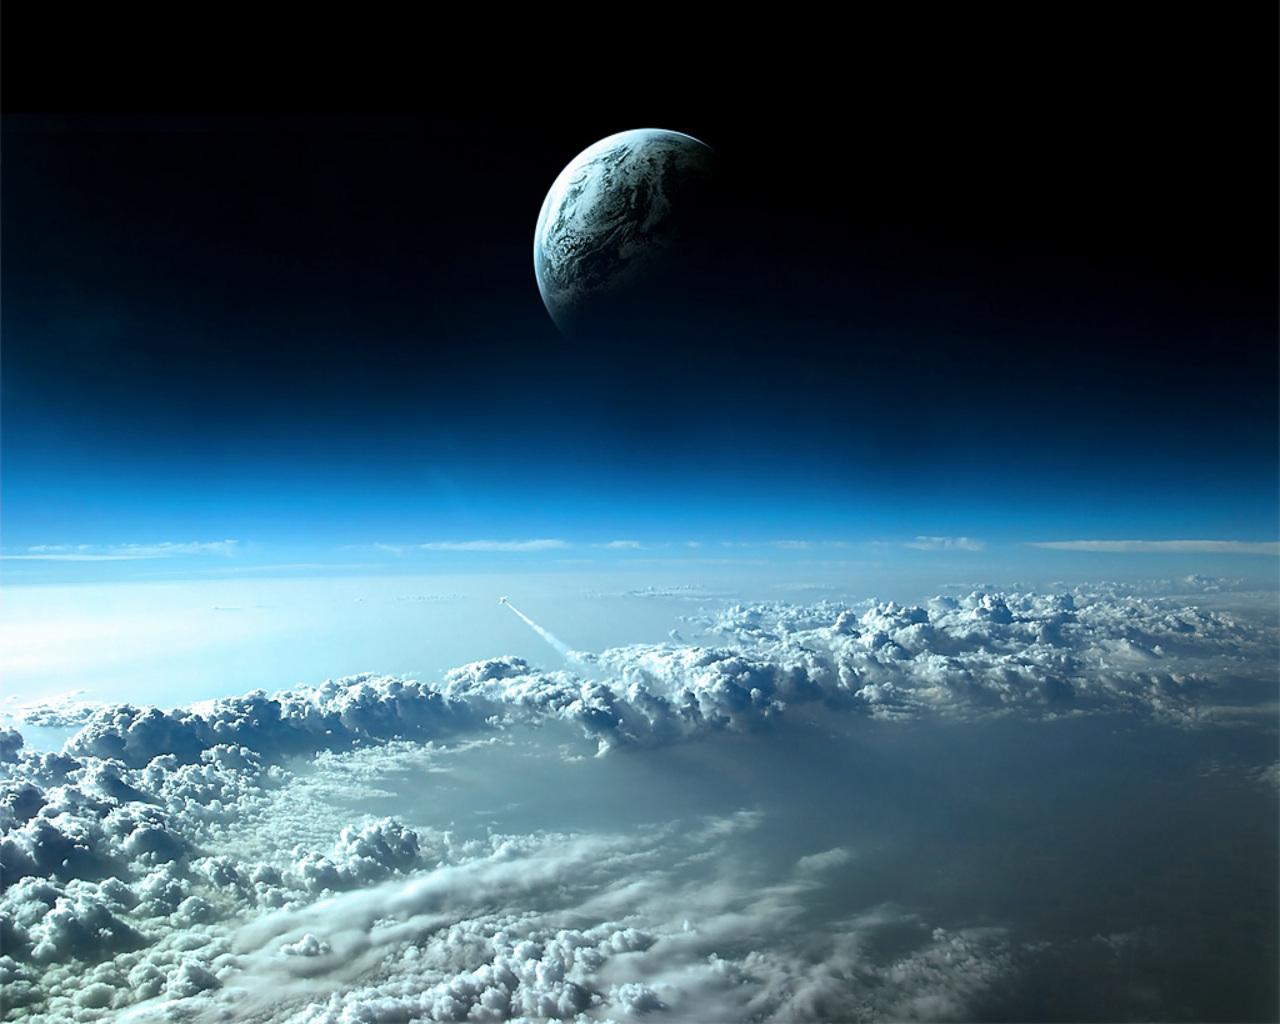 3D Space Scene Res: 1280x1024 / Size:274kb. Views: 477044